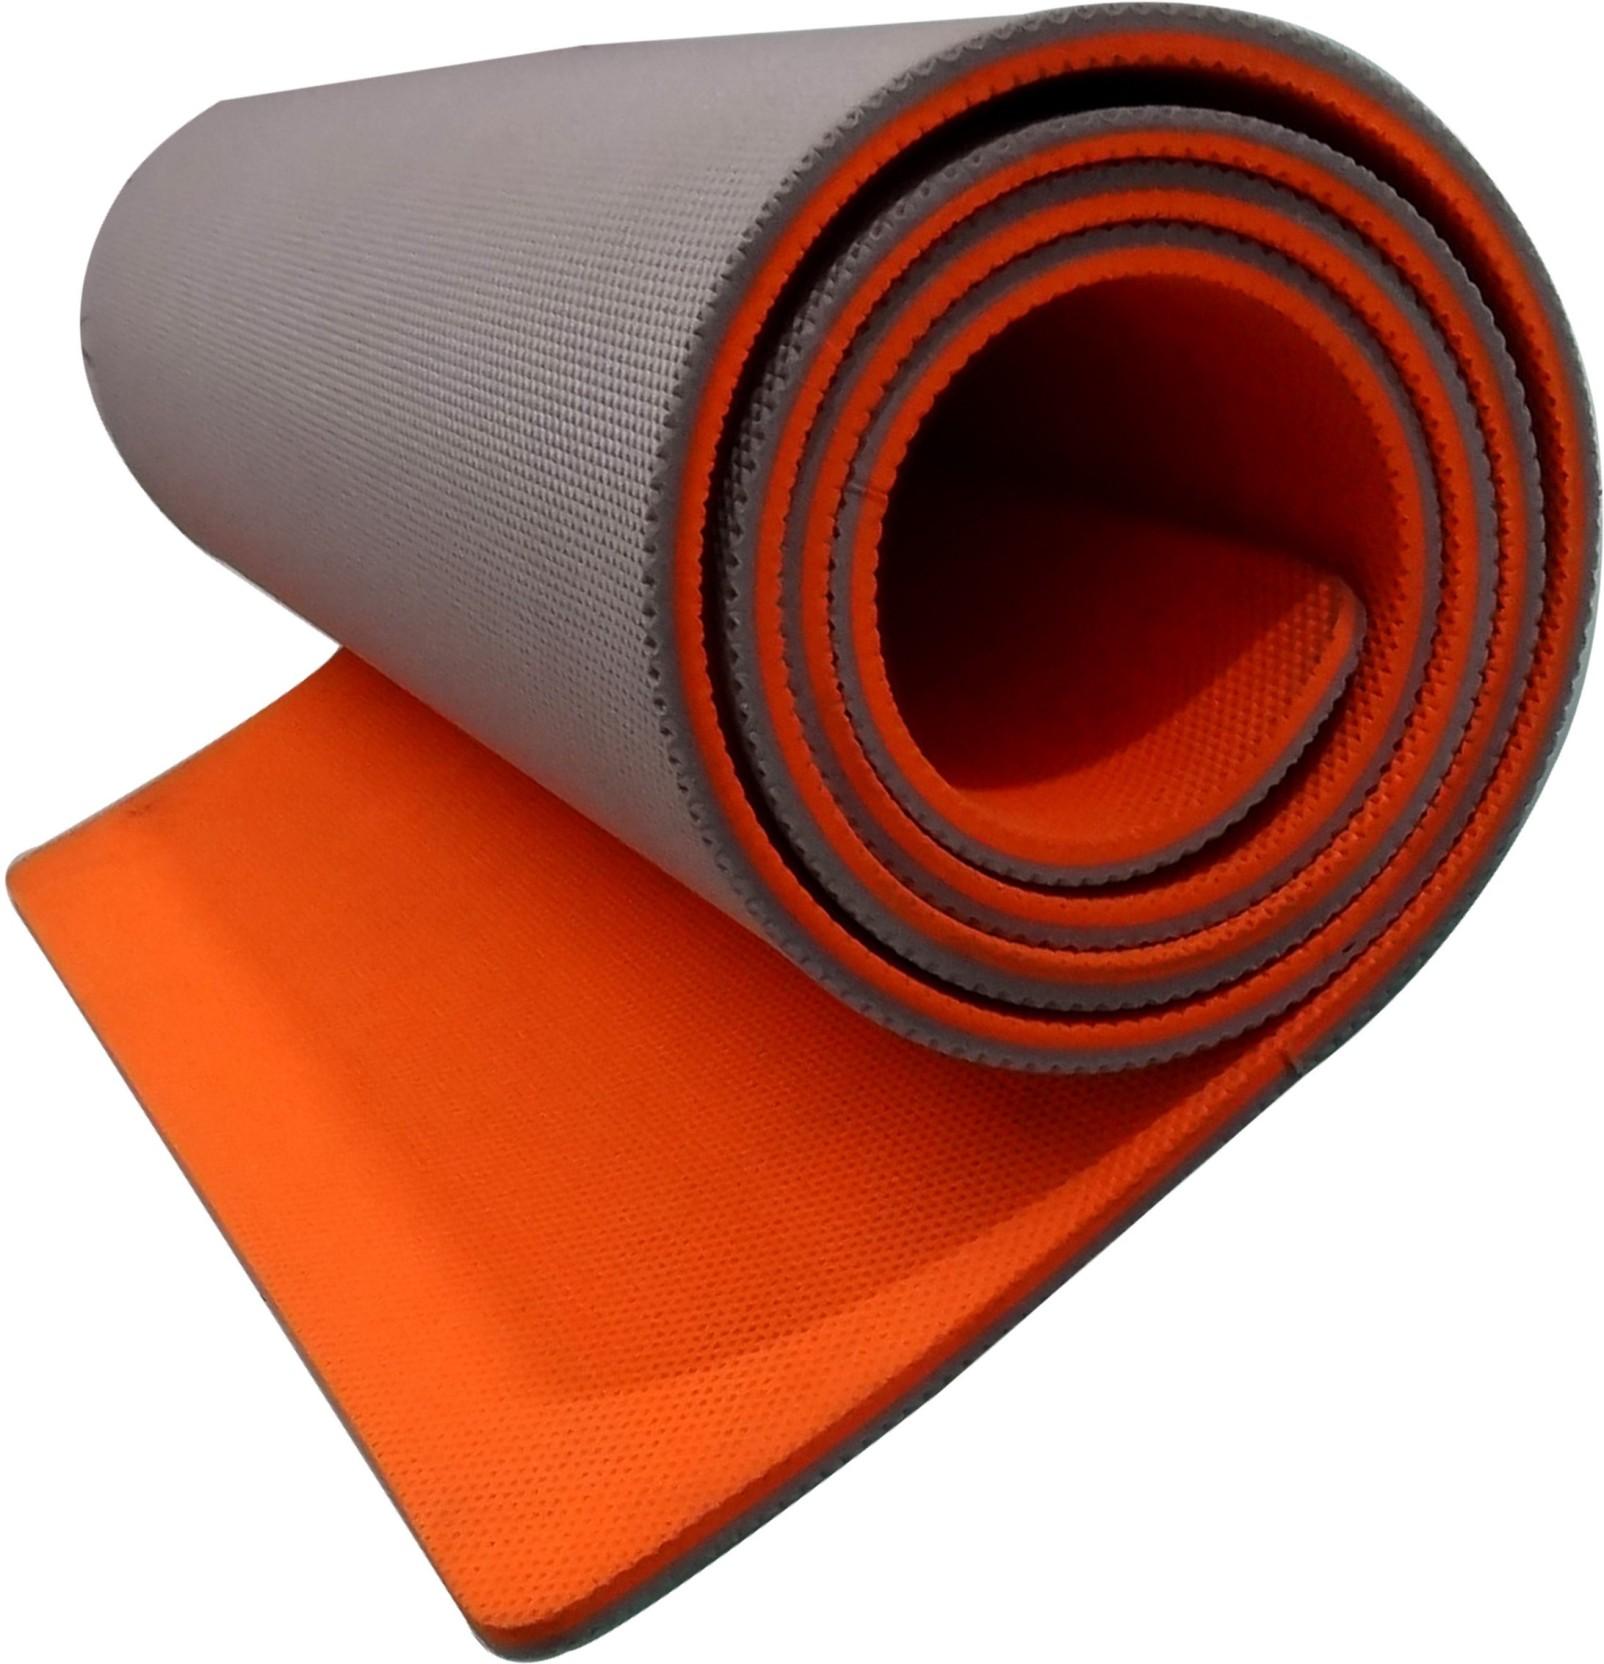 Aerolite Double Colour 36 X 78 Orange, Grey 10 Mm Yoga Mat